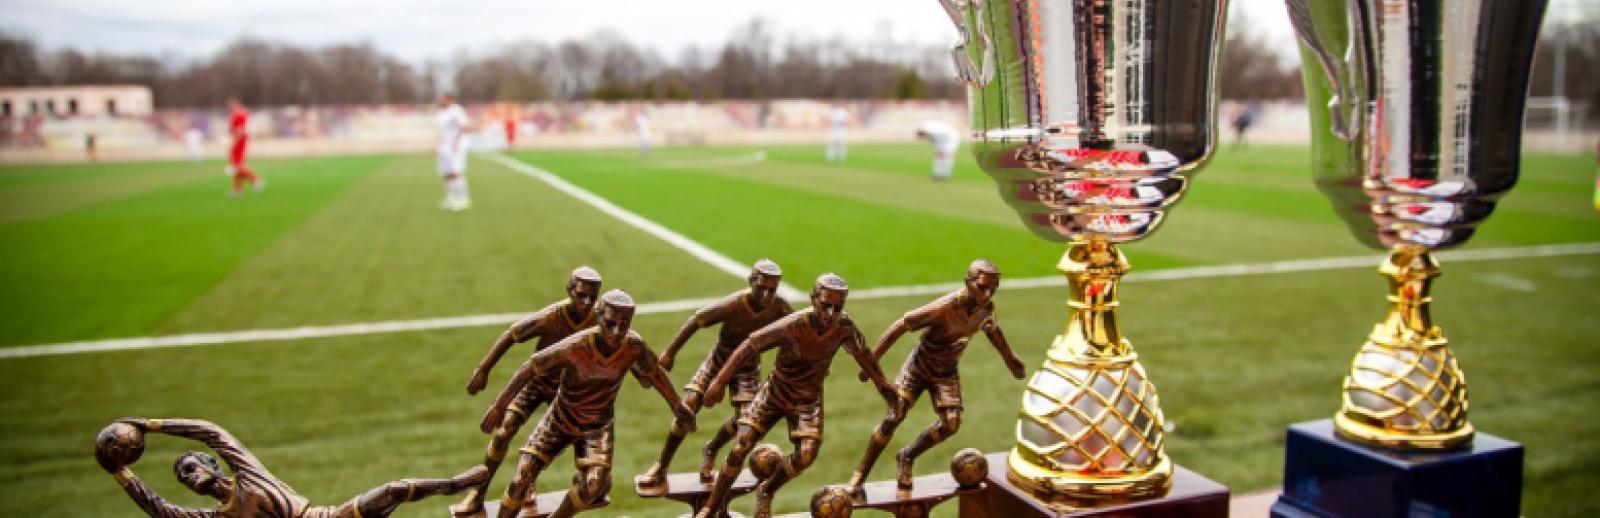 Кубок чемпионов МРО «Северо-Запад» - 2019 пройдет на стадионе «Электрон»